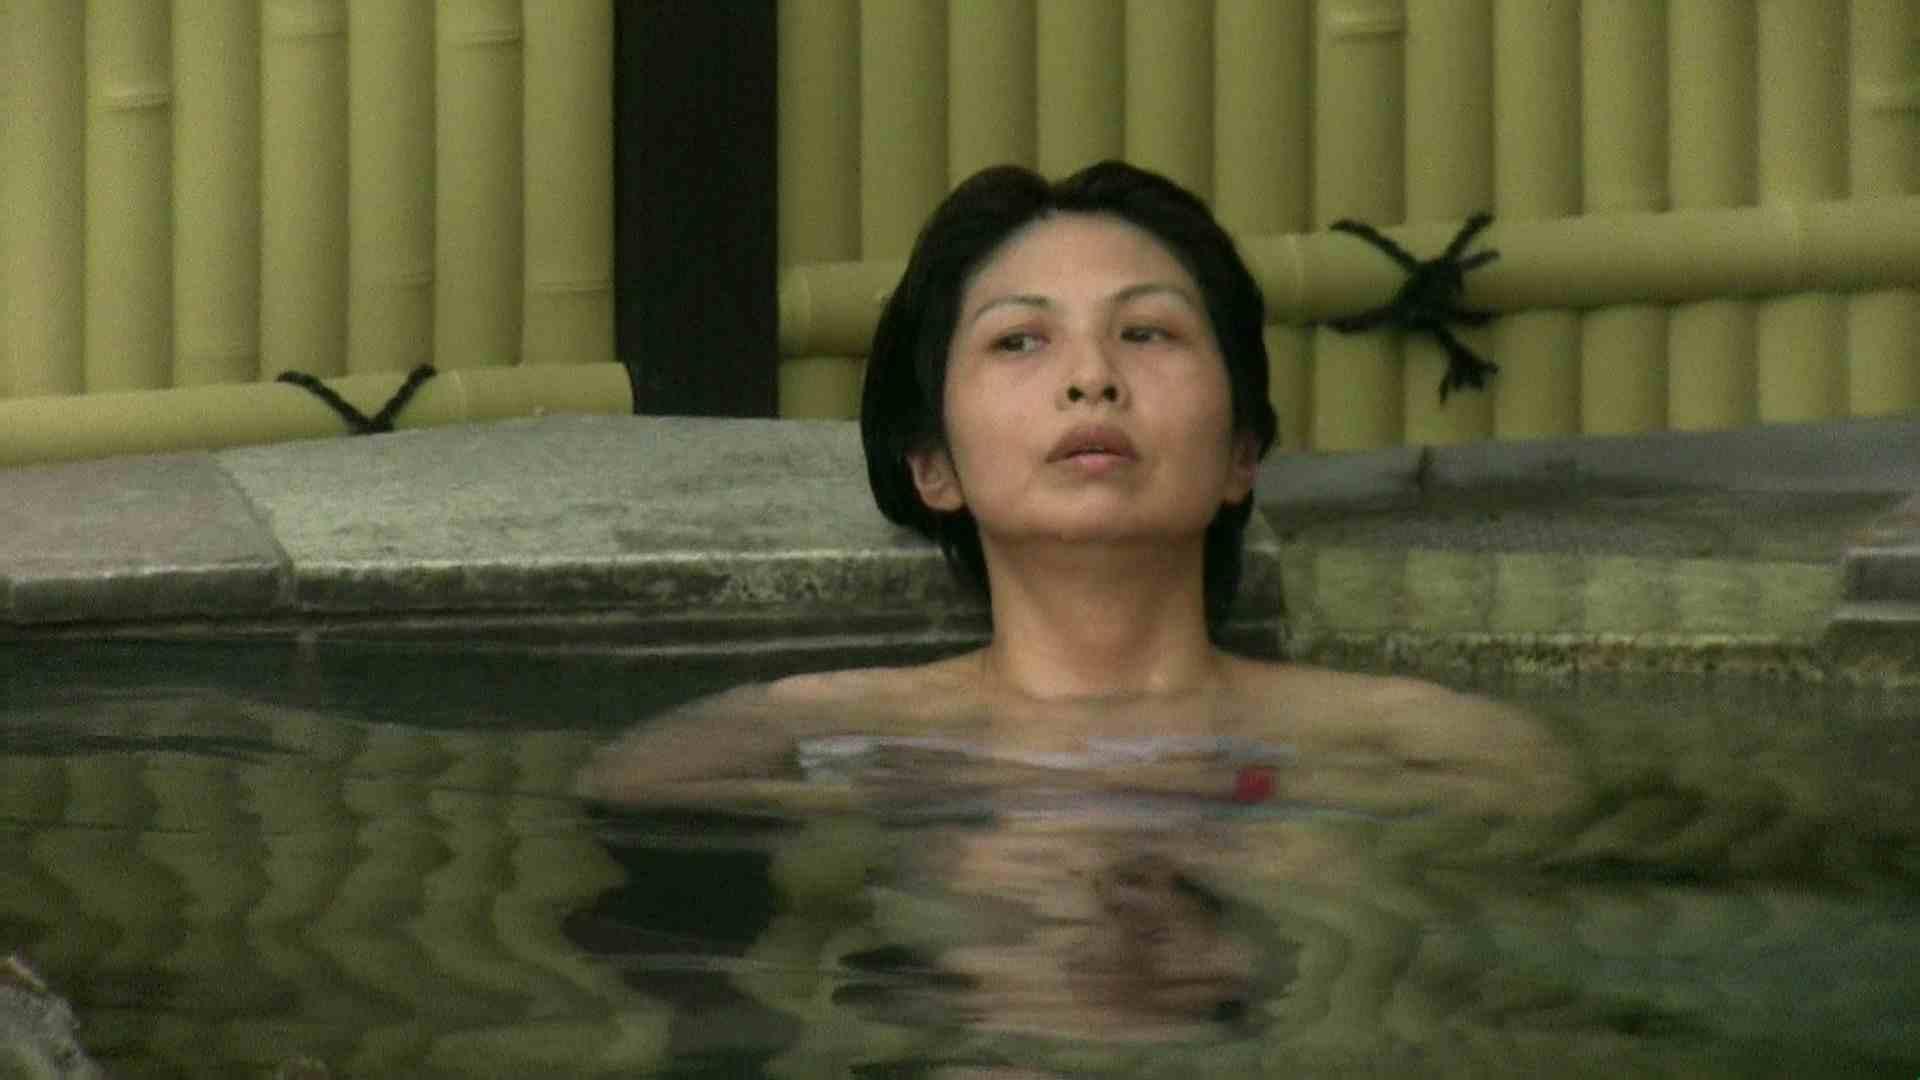 Aquaな露天風呂Vol.636 HなOL | 盗撮  82pic 22